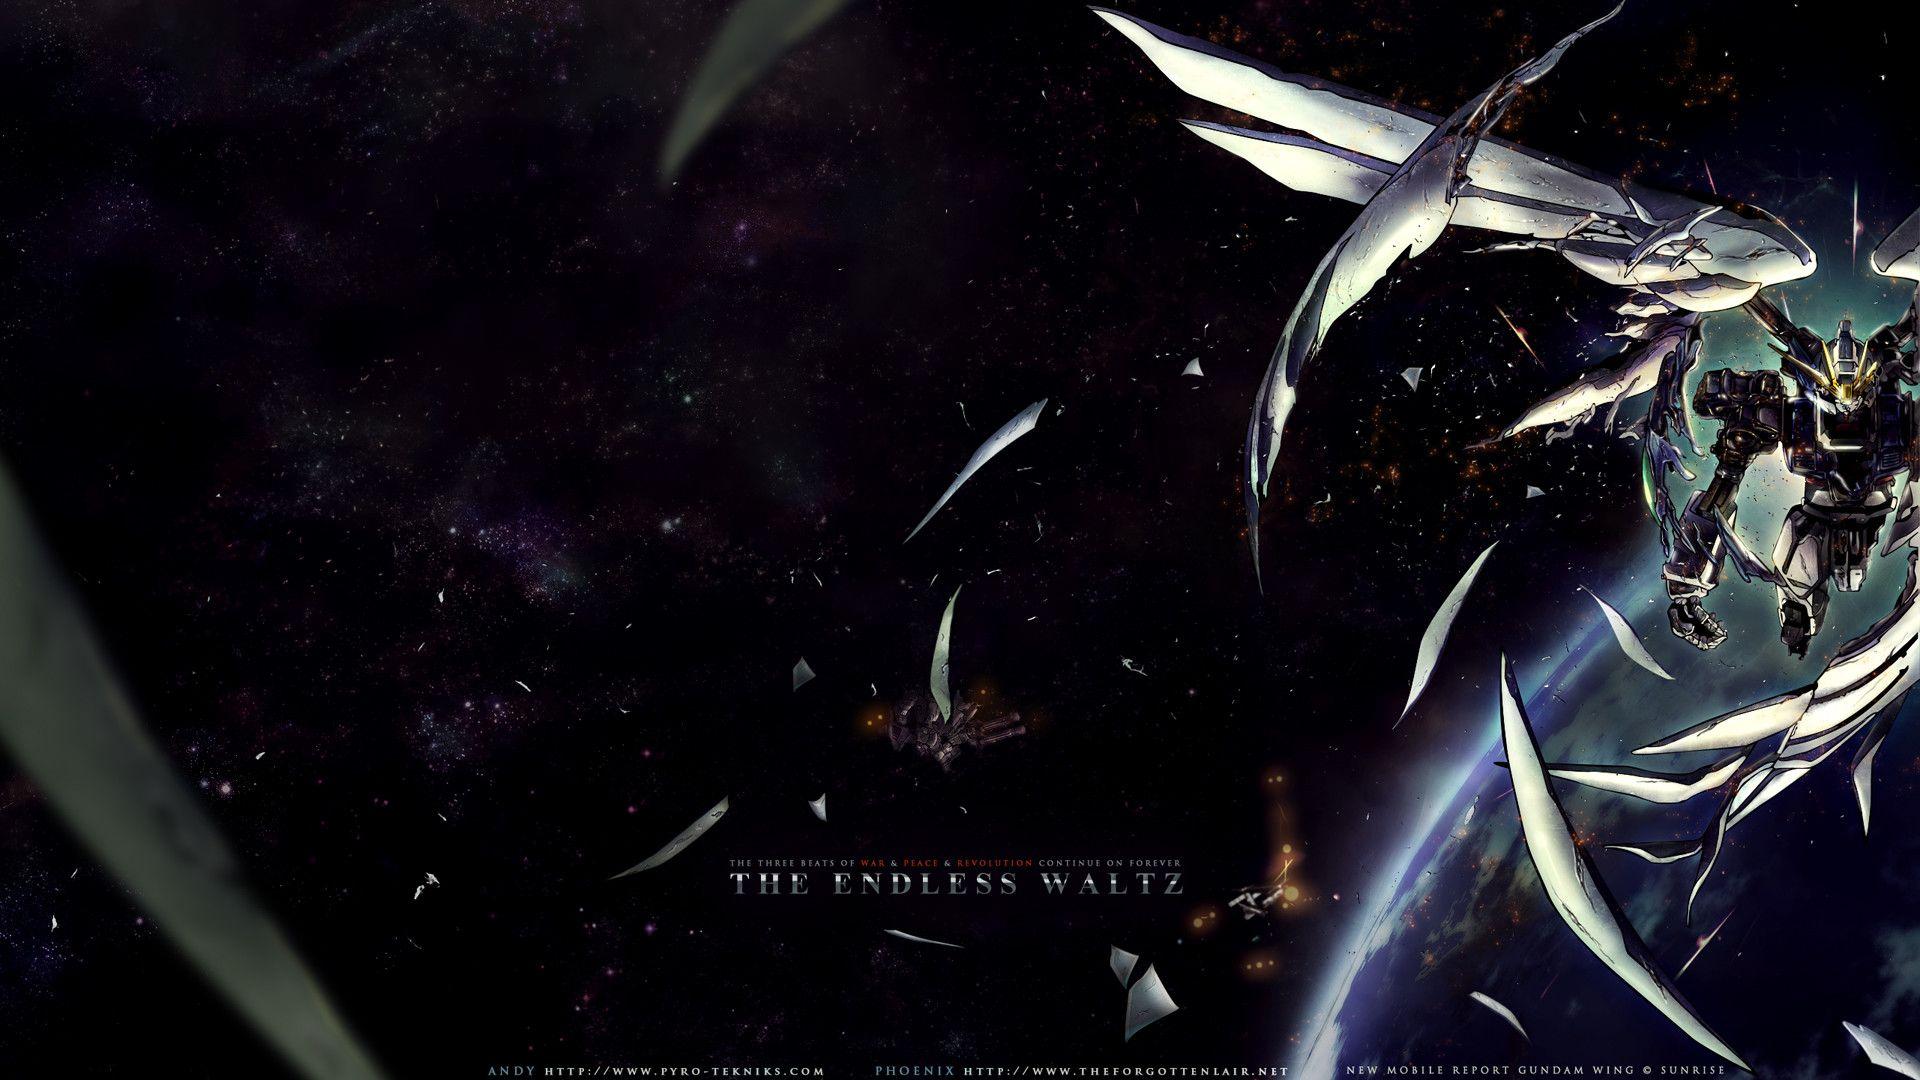 Res 1920x1080 Gundam Hd Wallpaper Hintergrund Id 226552 Wallpaper Abyss Anime Wallpaper 1920x1080 Hd Anime Wallpapers Gundam Wallpapers